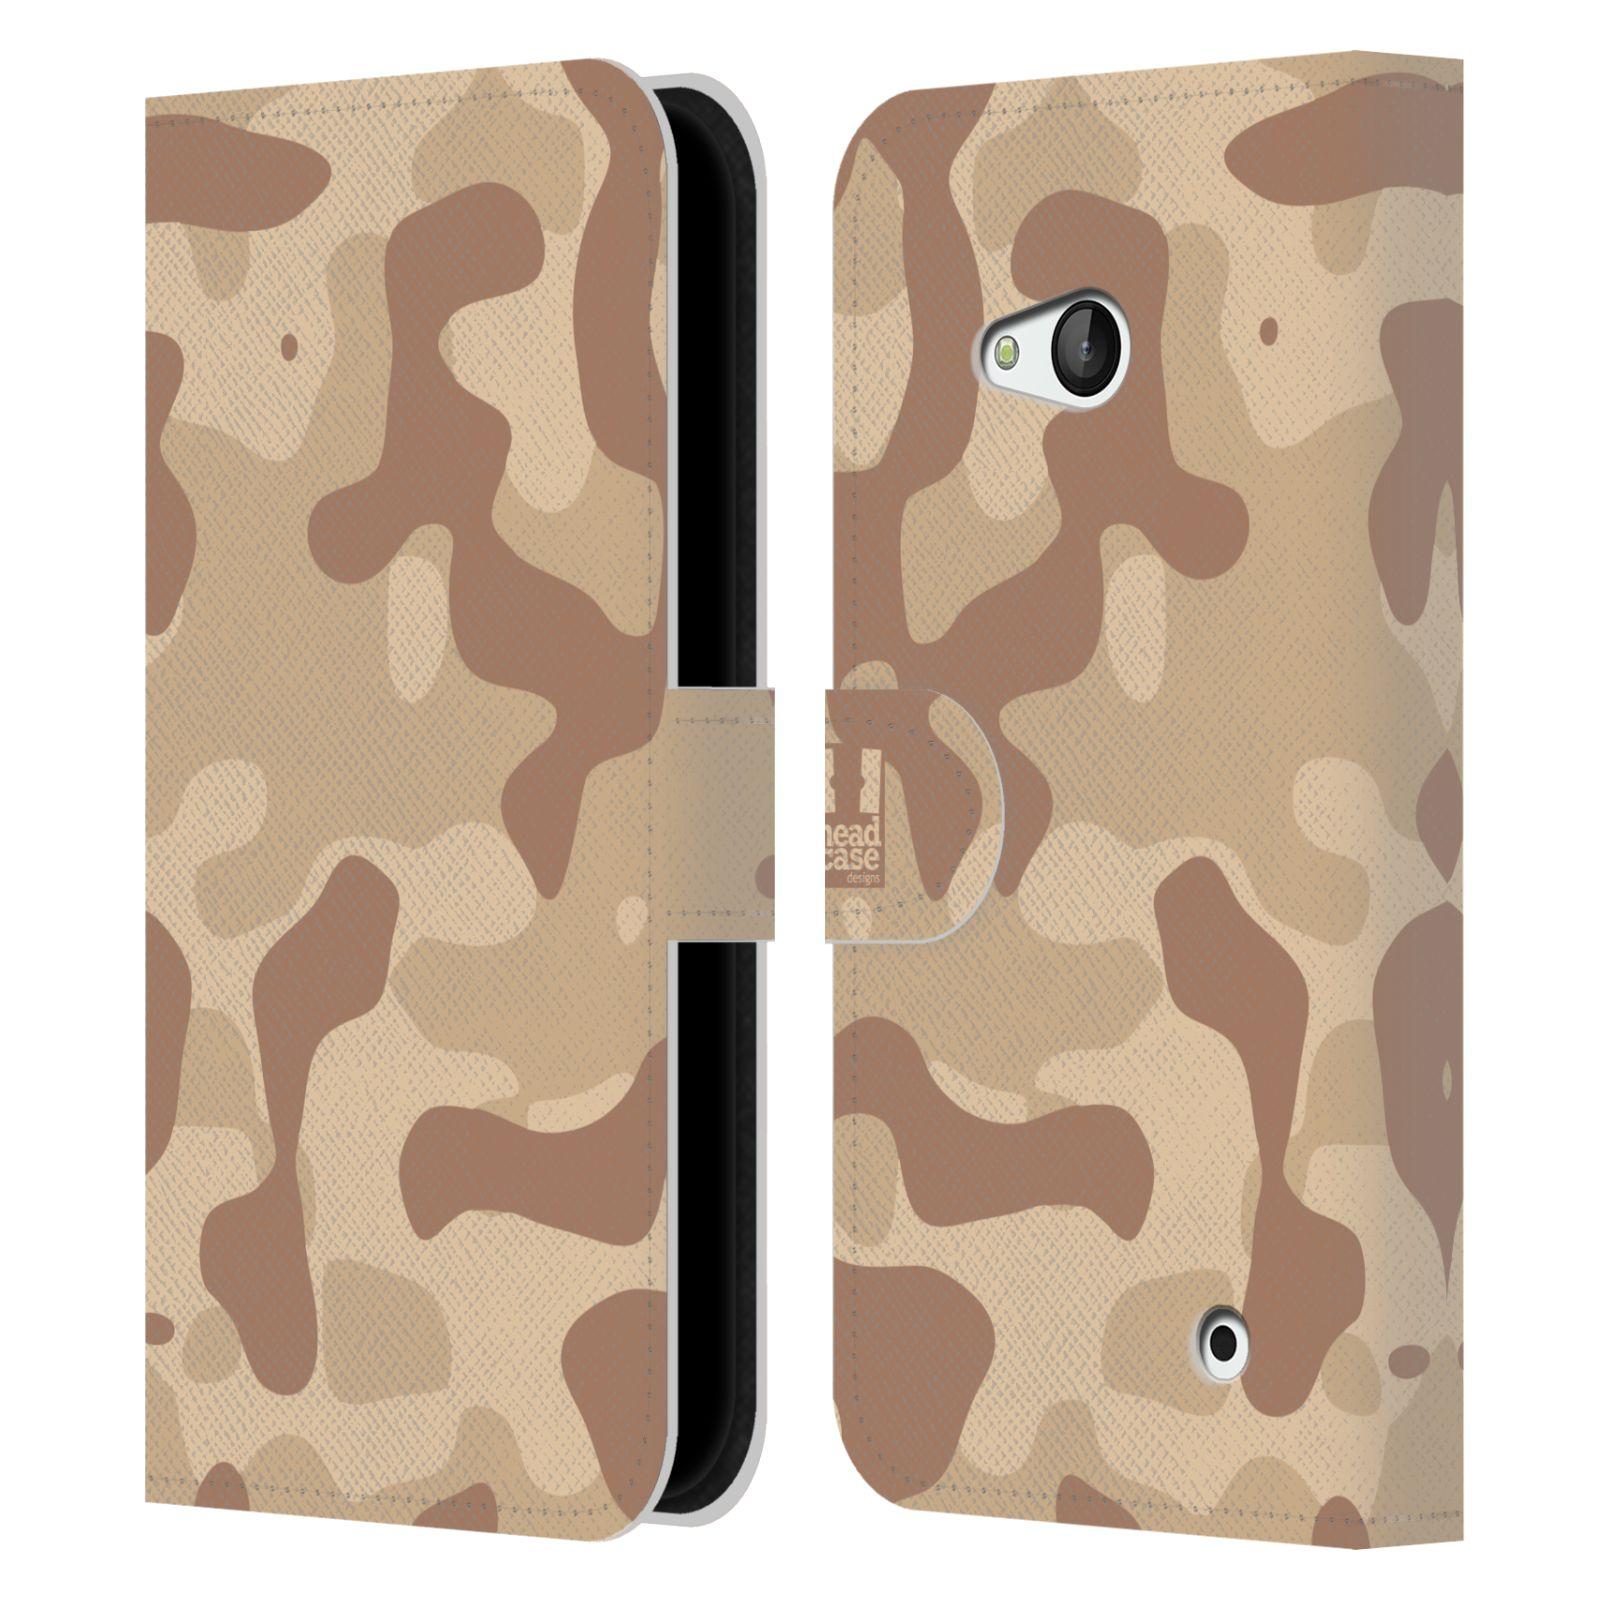 HEAD CASE Flipové pouzdro pro mobil NOKIA / MICROSOFT LUMIA 640 / LUMIA 640 DUAL lehká barevná kamufláž poušť